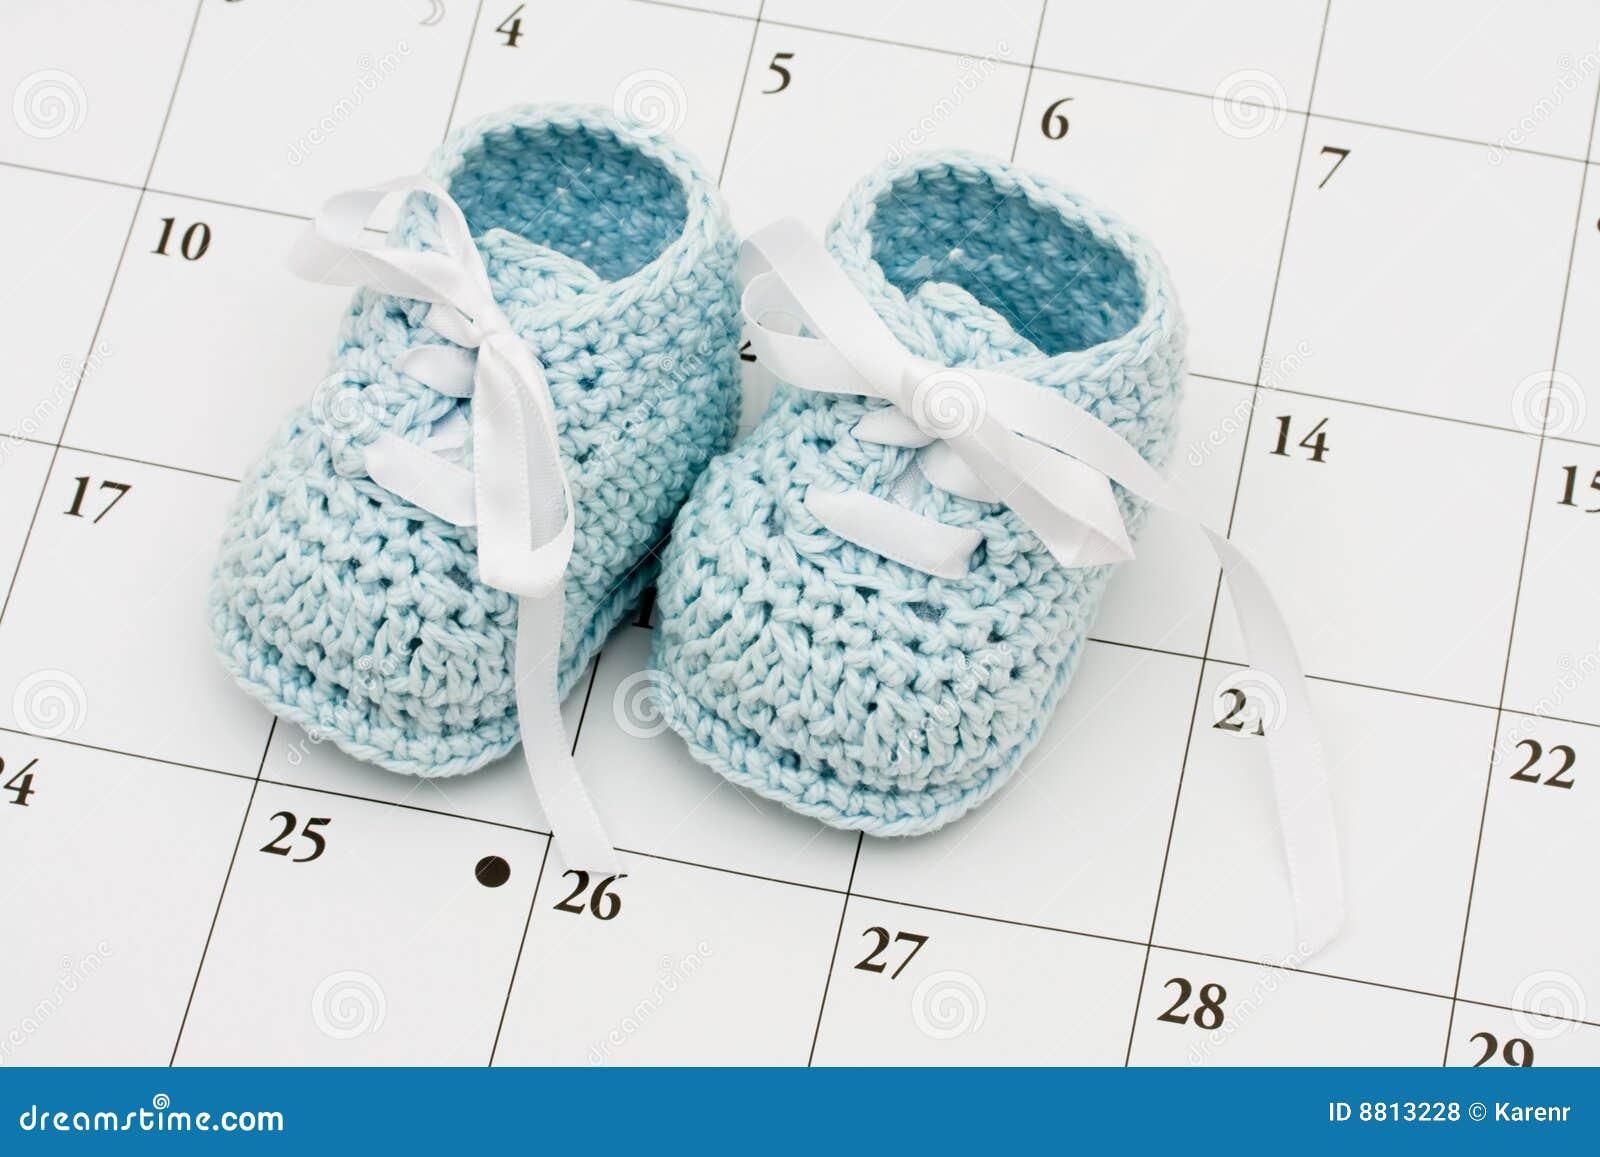 Baby due date calculator lmp